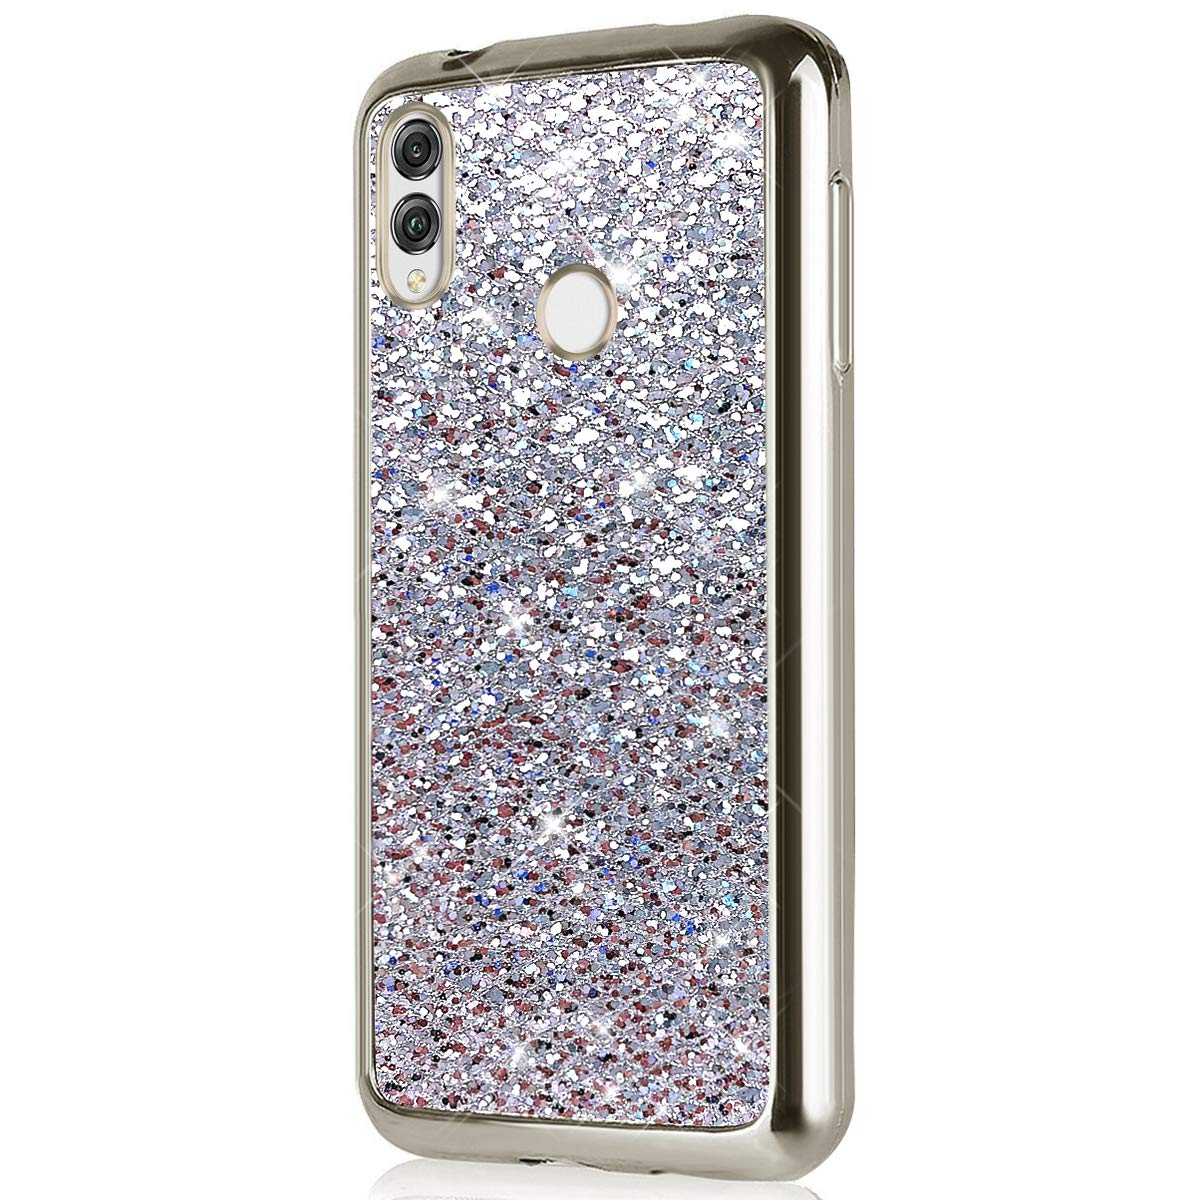 Felfy Kompatibel mit Huawei P Smart 2019 H/ülle Rosa,Bling Glitzer Gl/änzend Pailletten Luxus Schutzh/ülle Ultra D/ünn Weich Gel TPU Silikon M/ädchen Handyh/ülle Handytasche Kratzfeste Bumper Cover Case